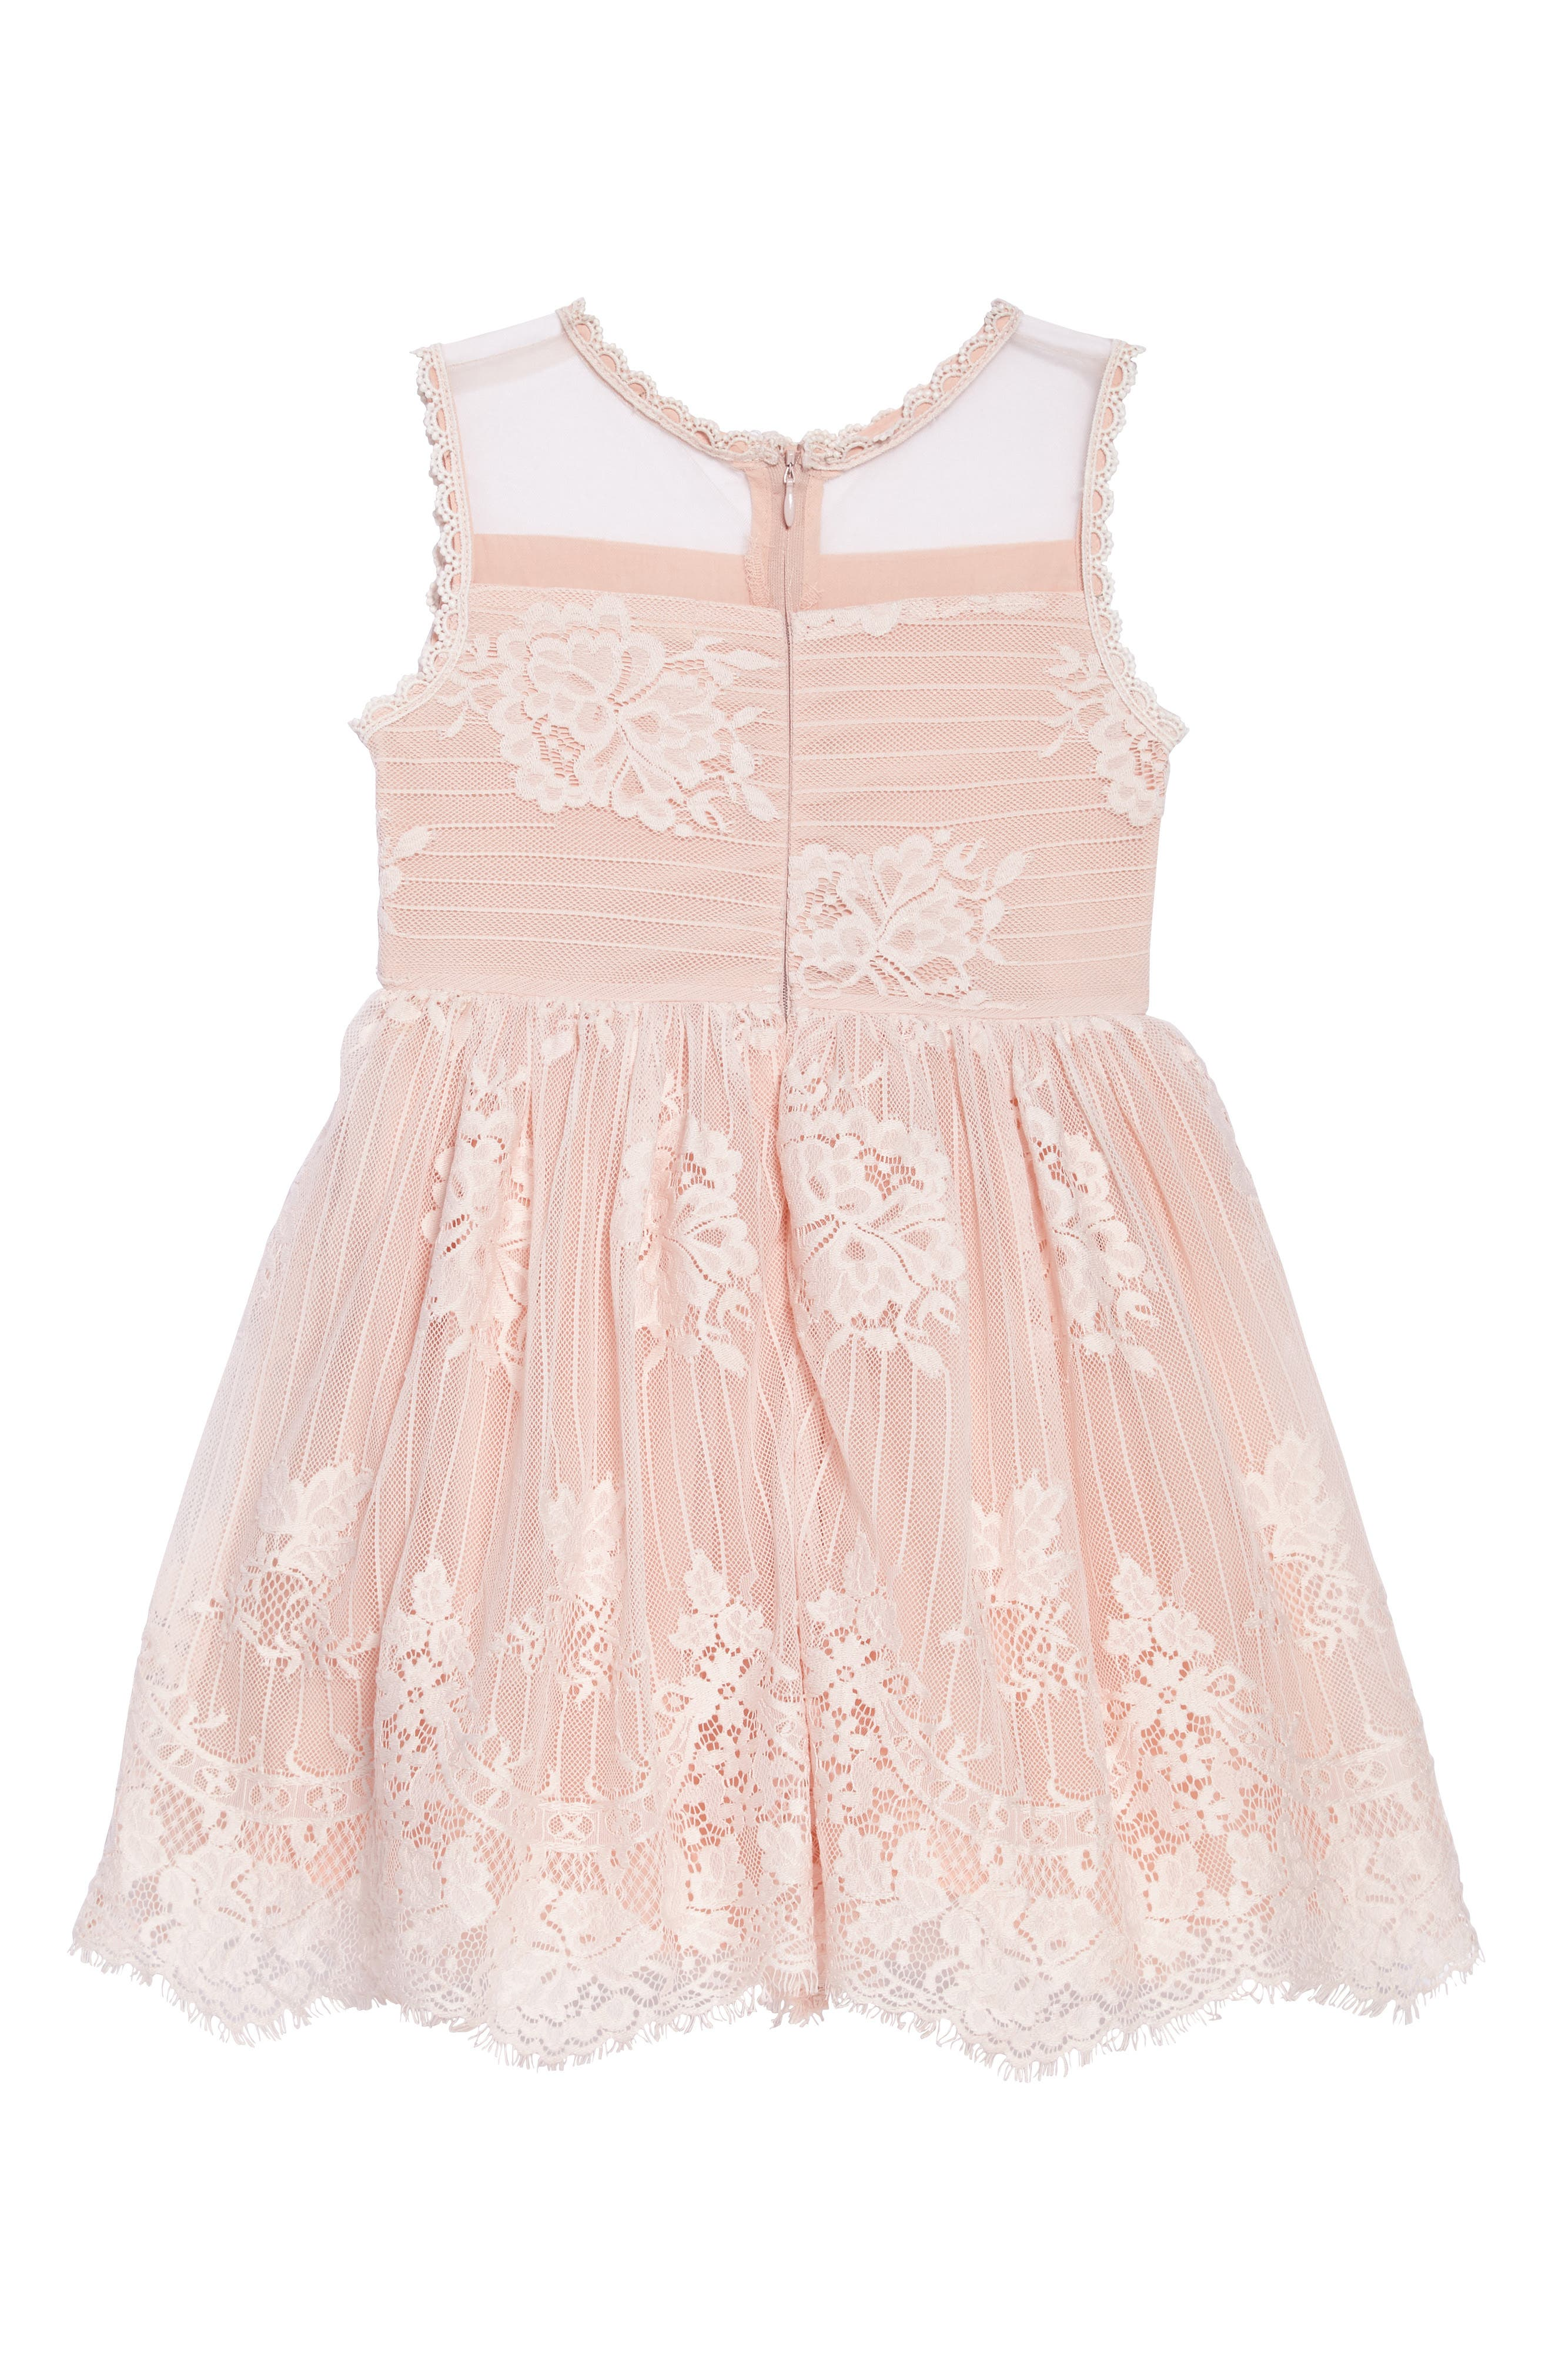 Lace Fit & Flare Dress,                             Alternate thumbnail 2, color,                             650